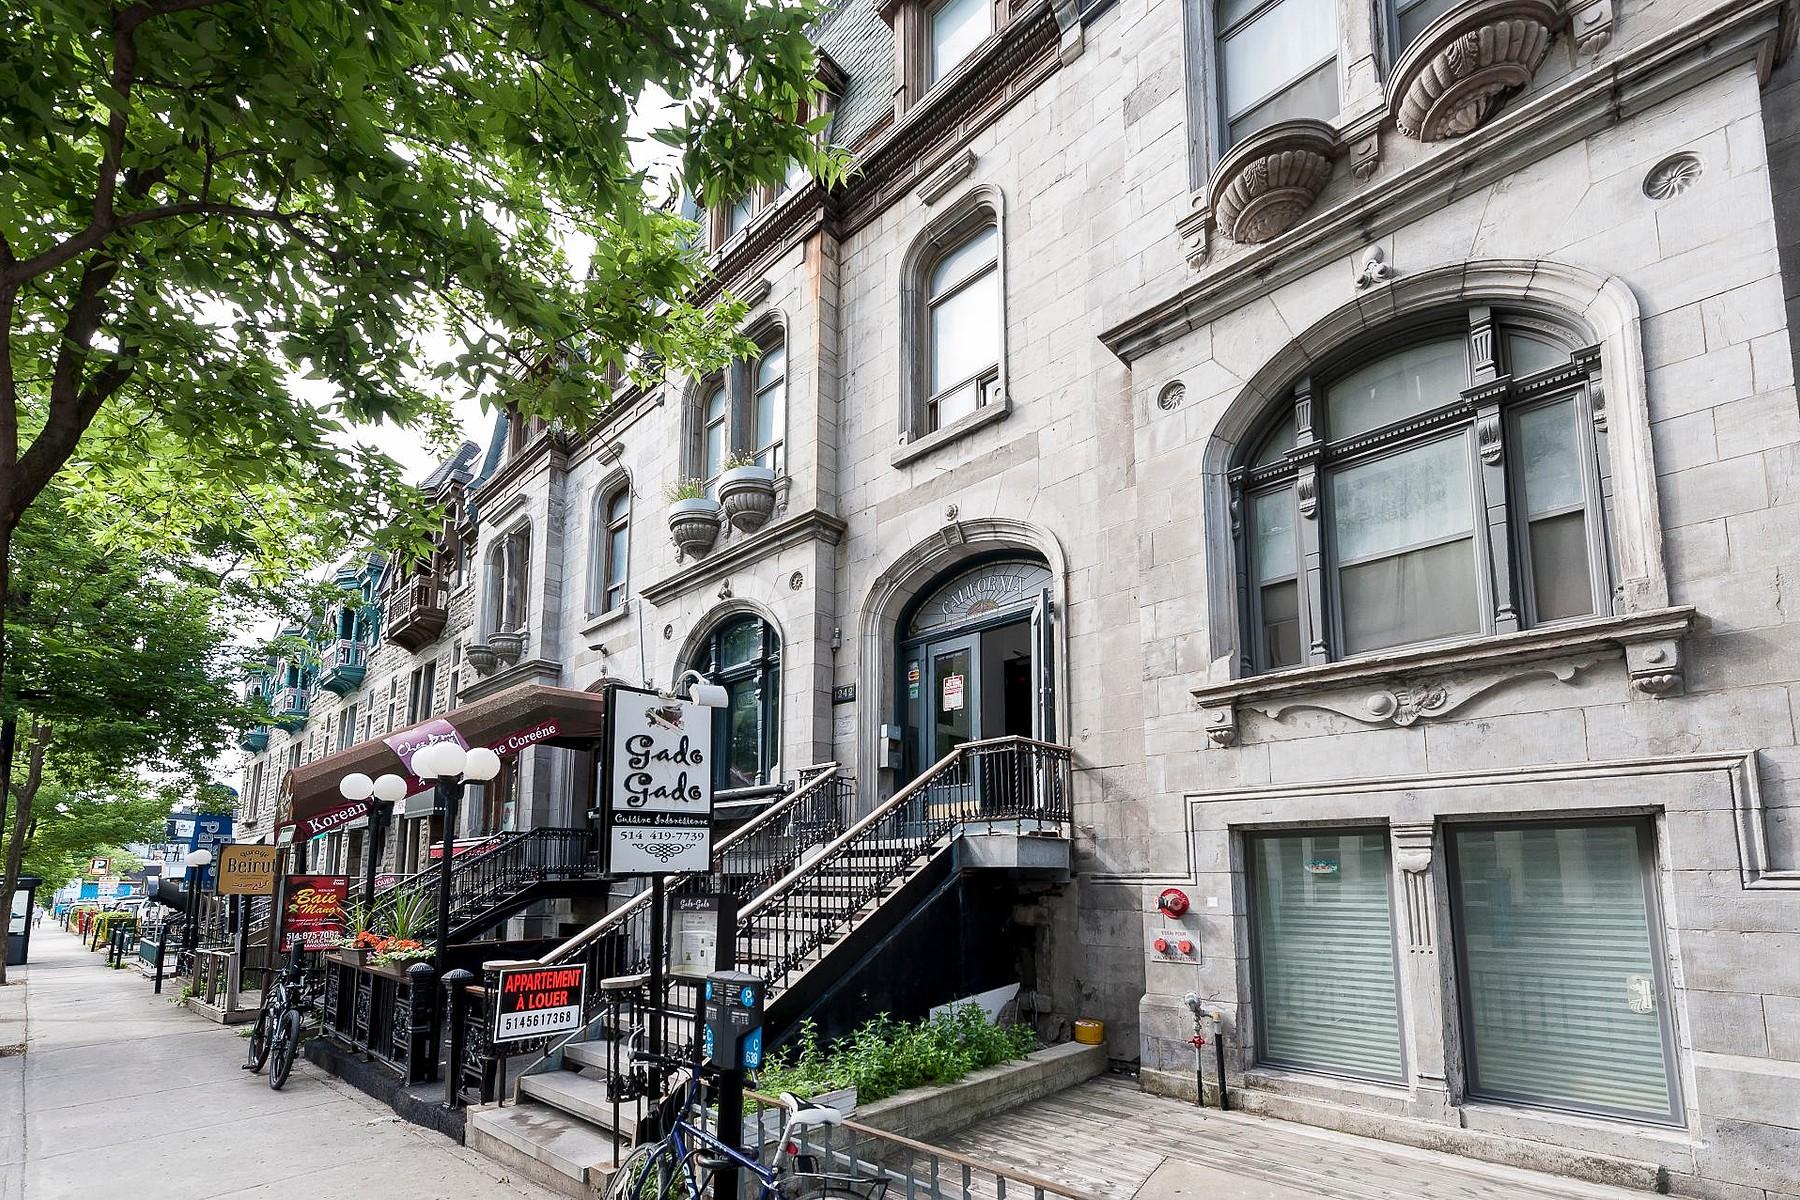 Nhà ở nhiều gia đình vì Bán tại Ville-Marie, Montréal 1242A Rue MacKay Ville-Marie, Quebec, H3G2H4 Canada